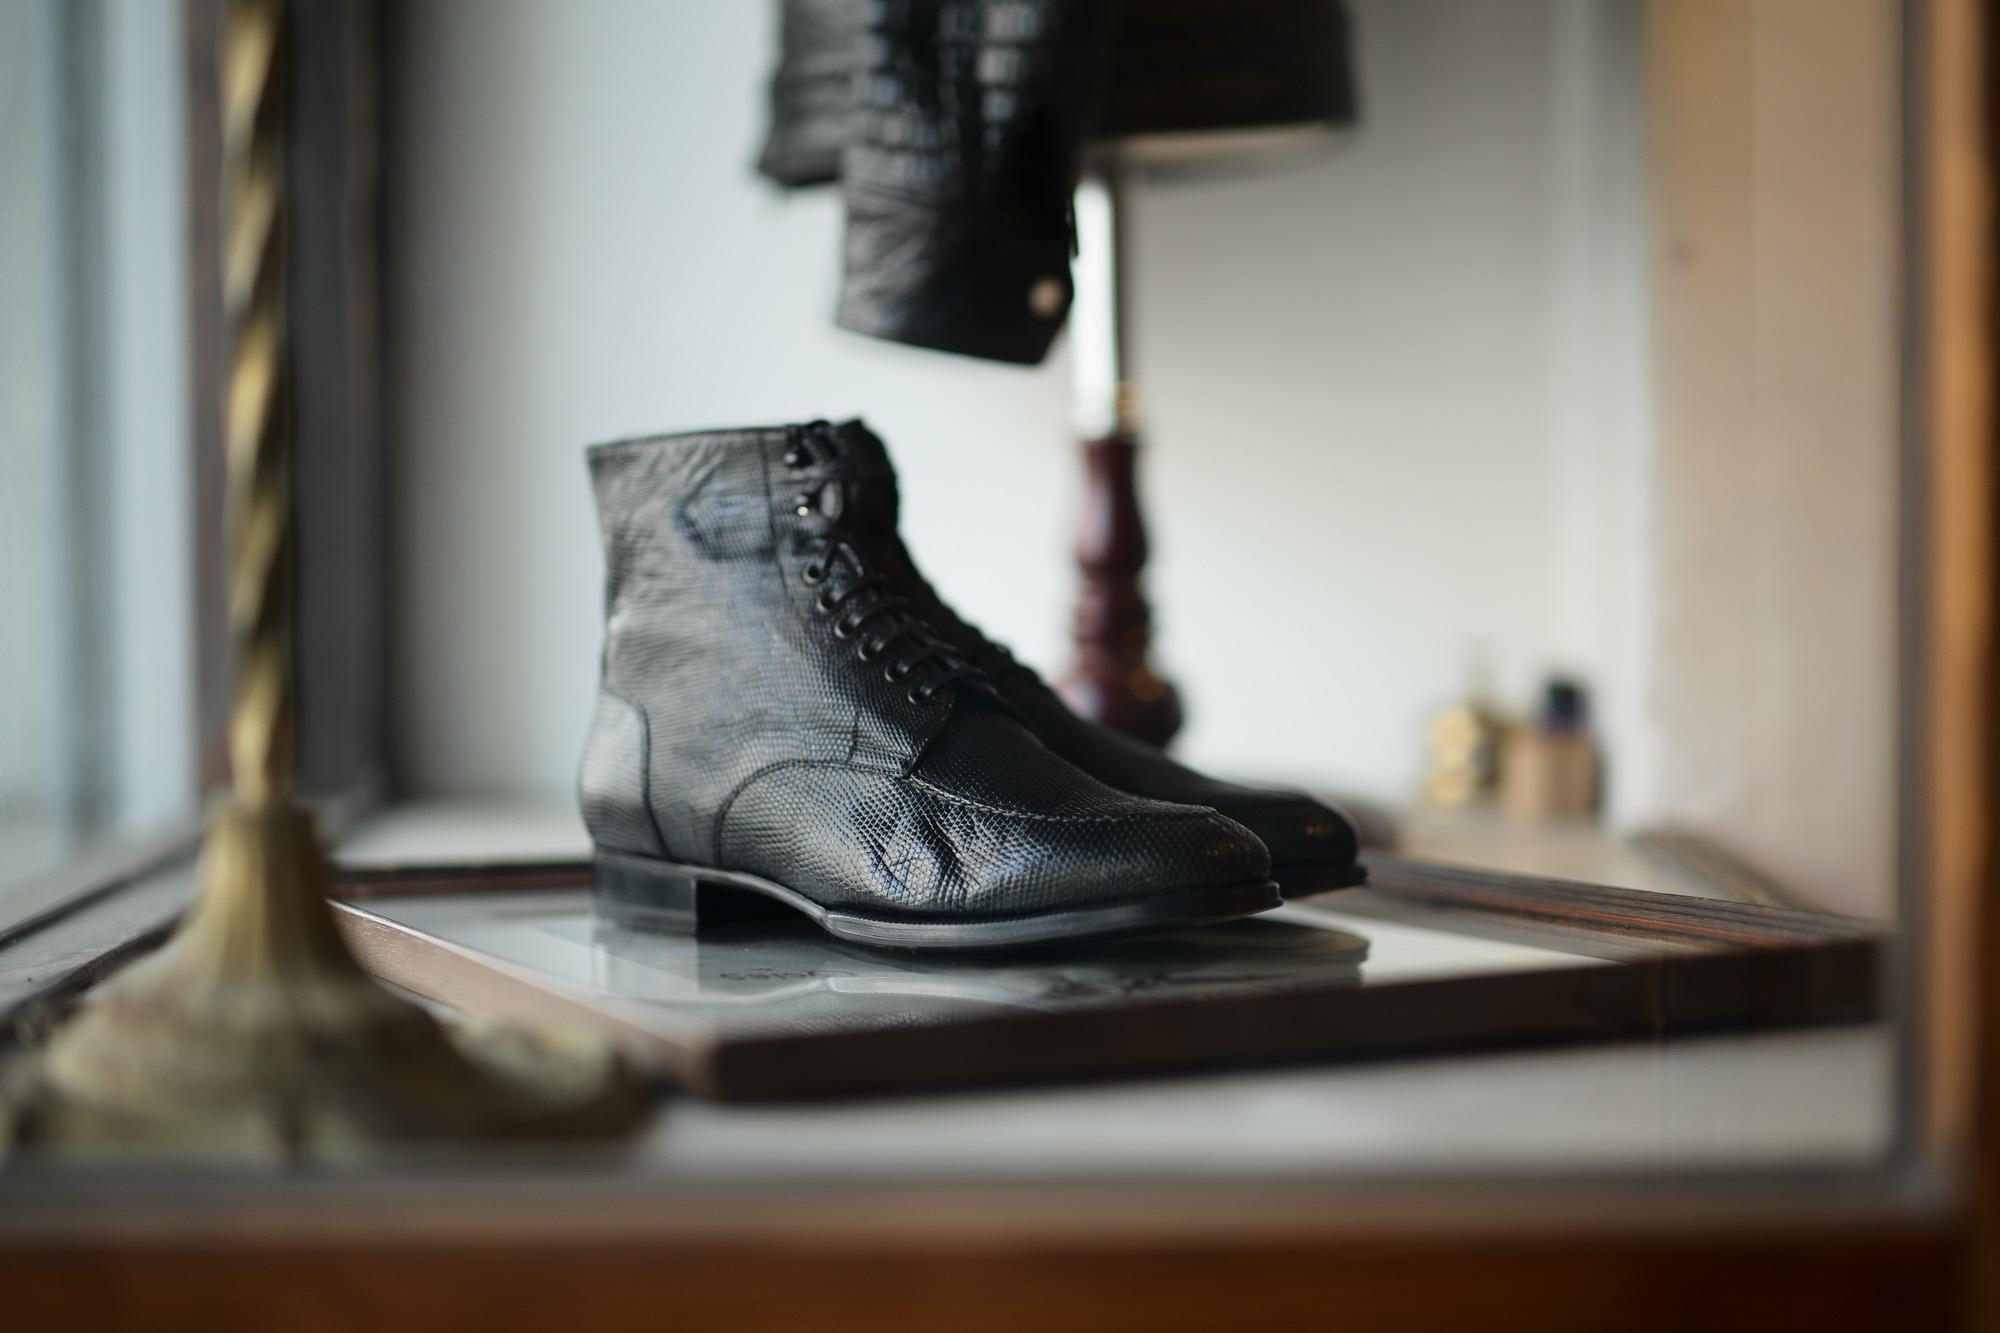 ENZO BONAFE(エンツォボナフェ) ART.4009 MOD Tanker Boots Lizard Leather リザードレザー タンカーブーツ NERO(ブラック) 2021春夏新作 【Special Model】愛知 名古屋 Alto e Diritto altoediritto アルトエデリット レザーブーツ